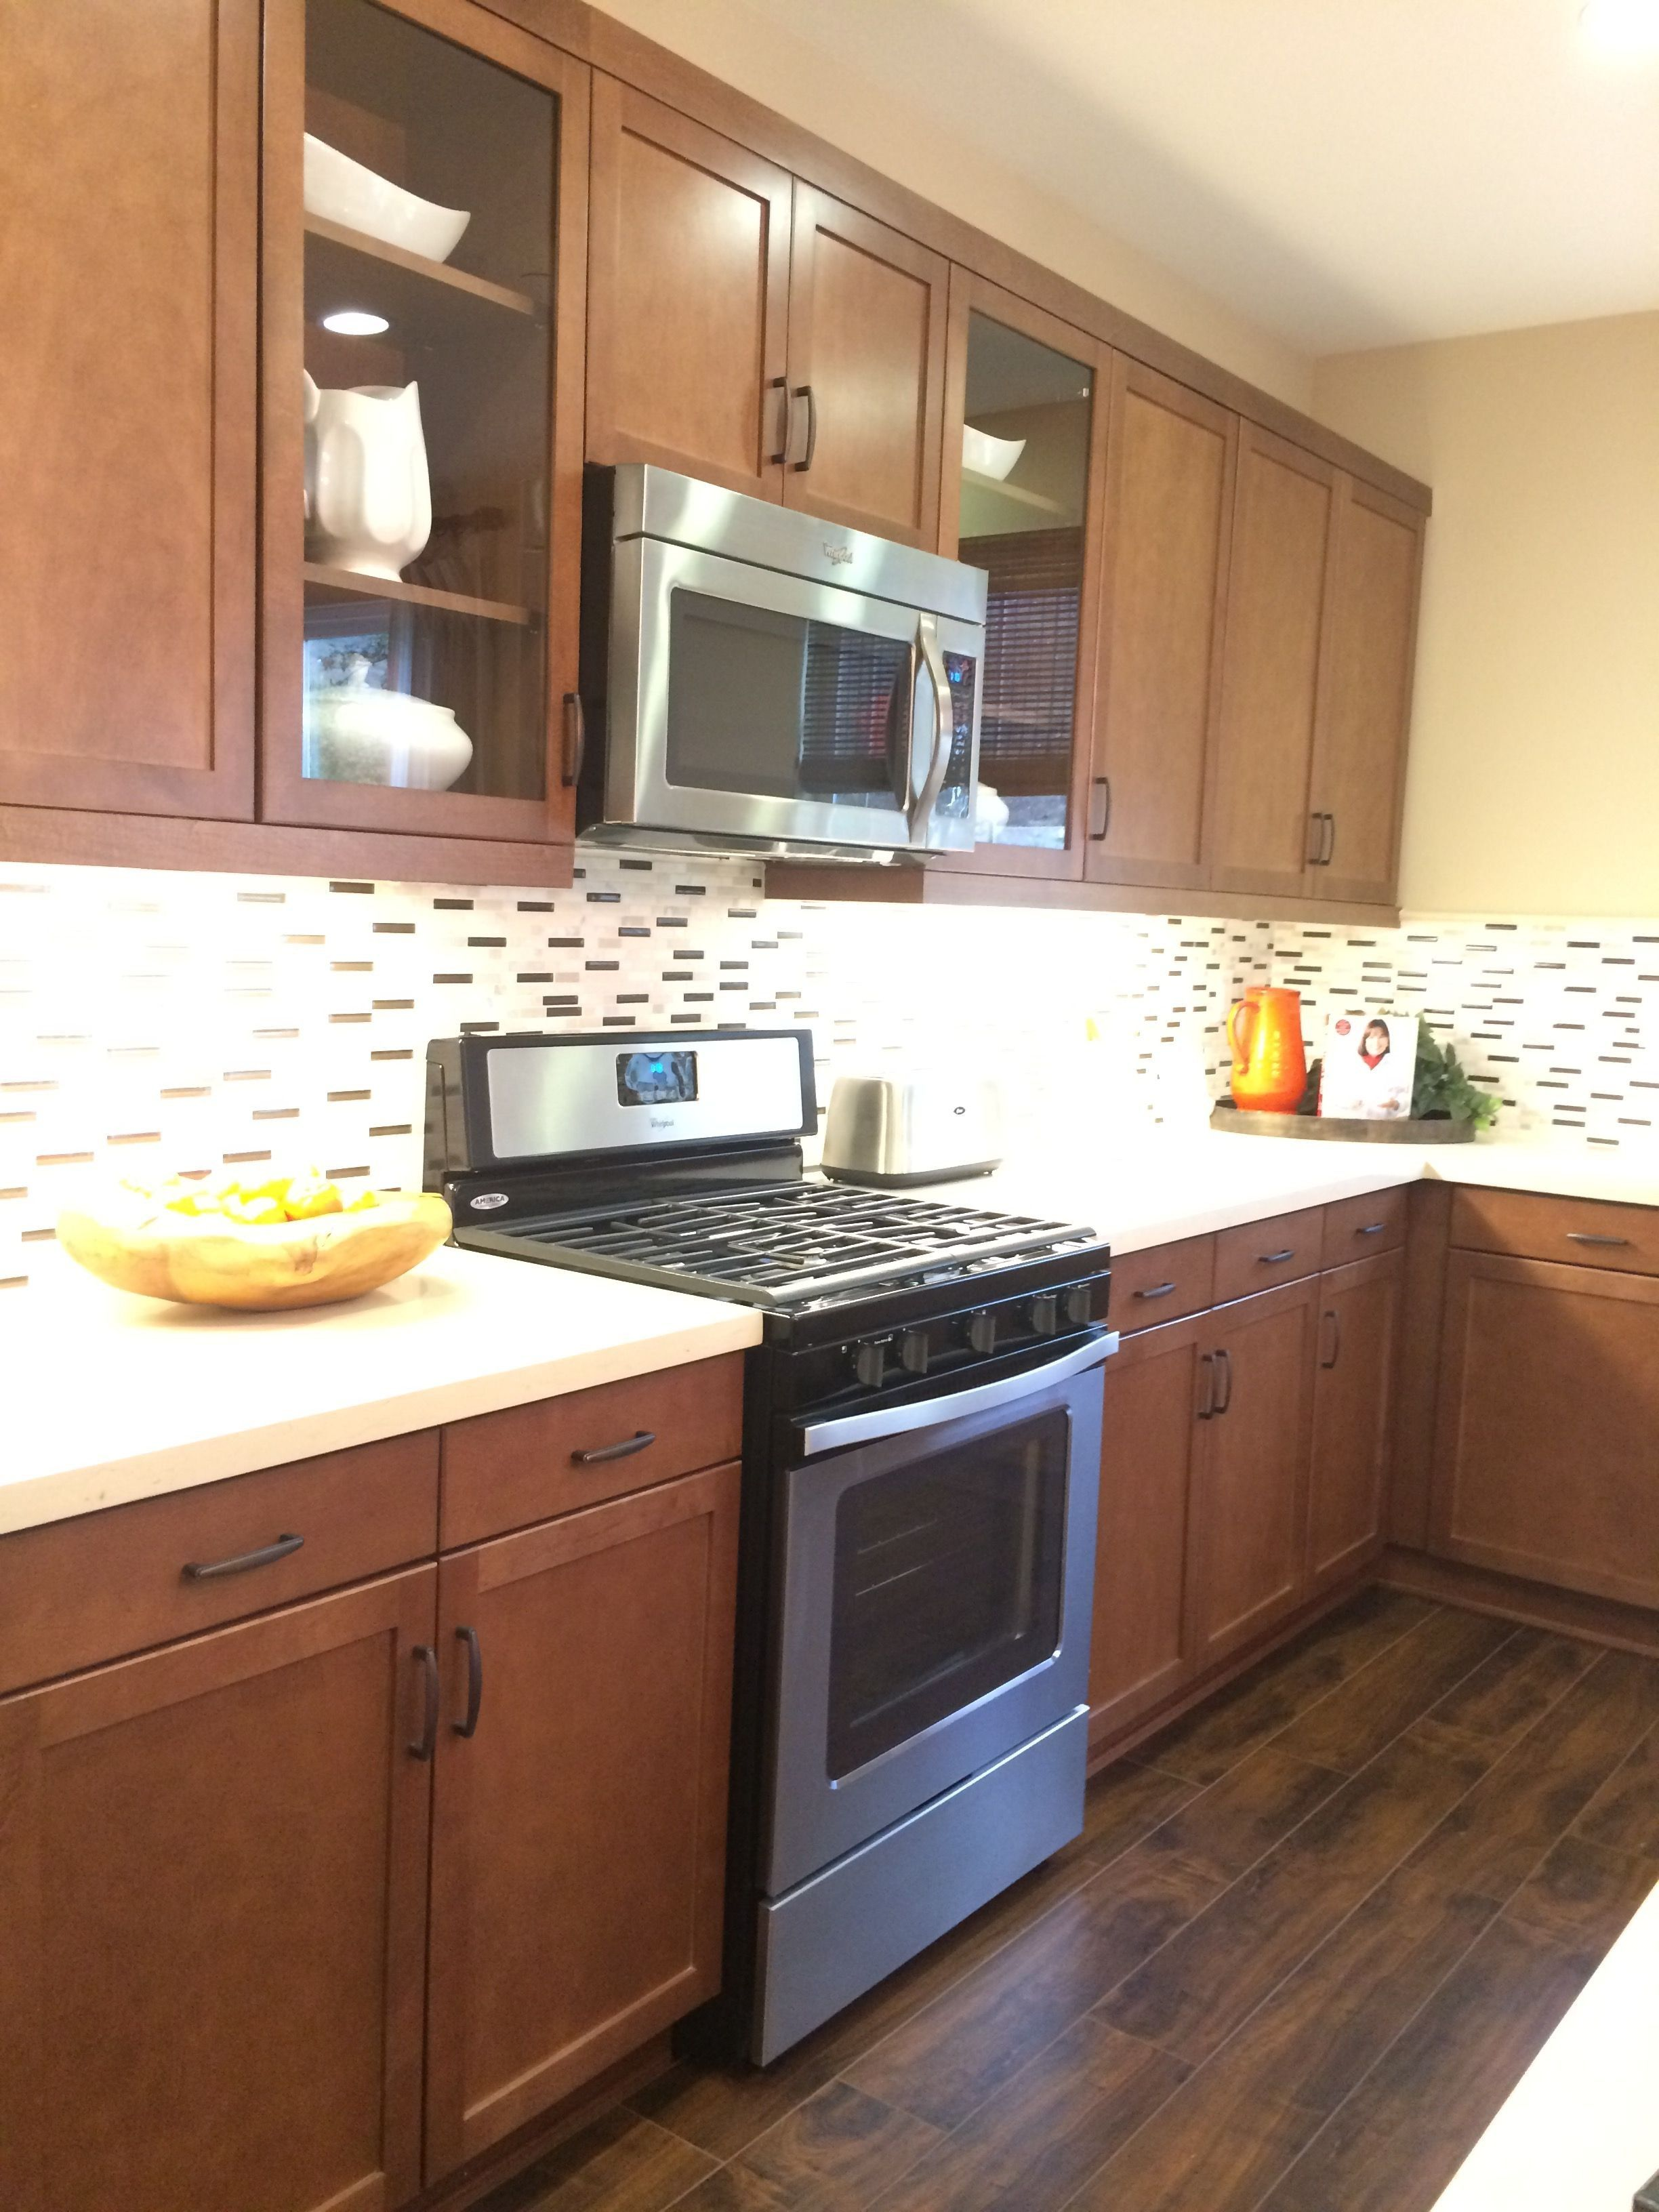 Kitchen With Light Brown Cabinet In 2020 Kitchen Ideas Medium Brown Cabinets Brown Kitchen Cabinets Kitchen Ideas Light Brown Cabinets